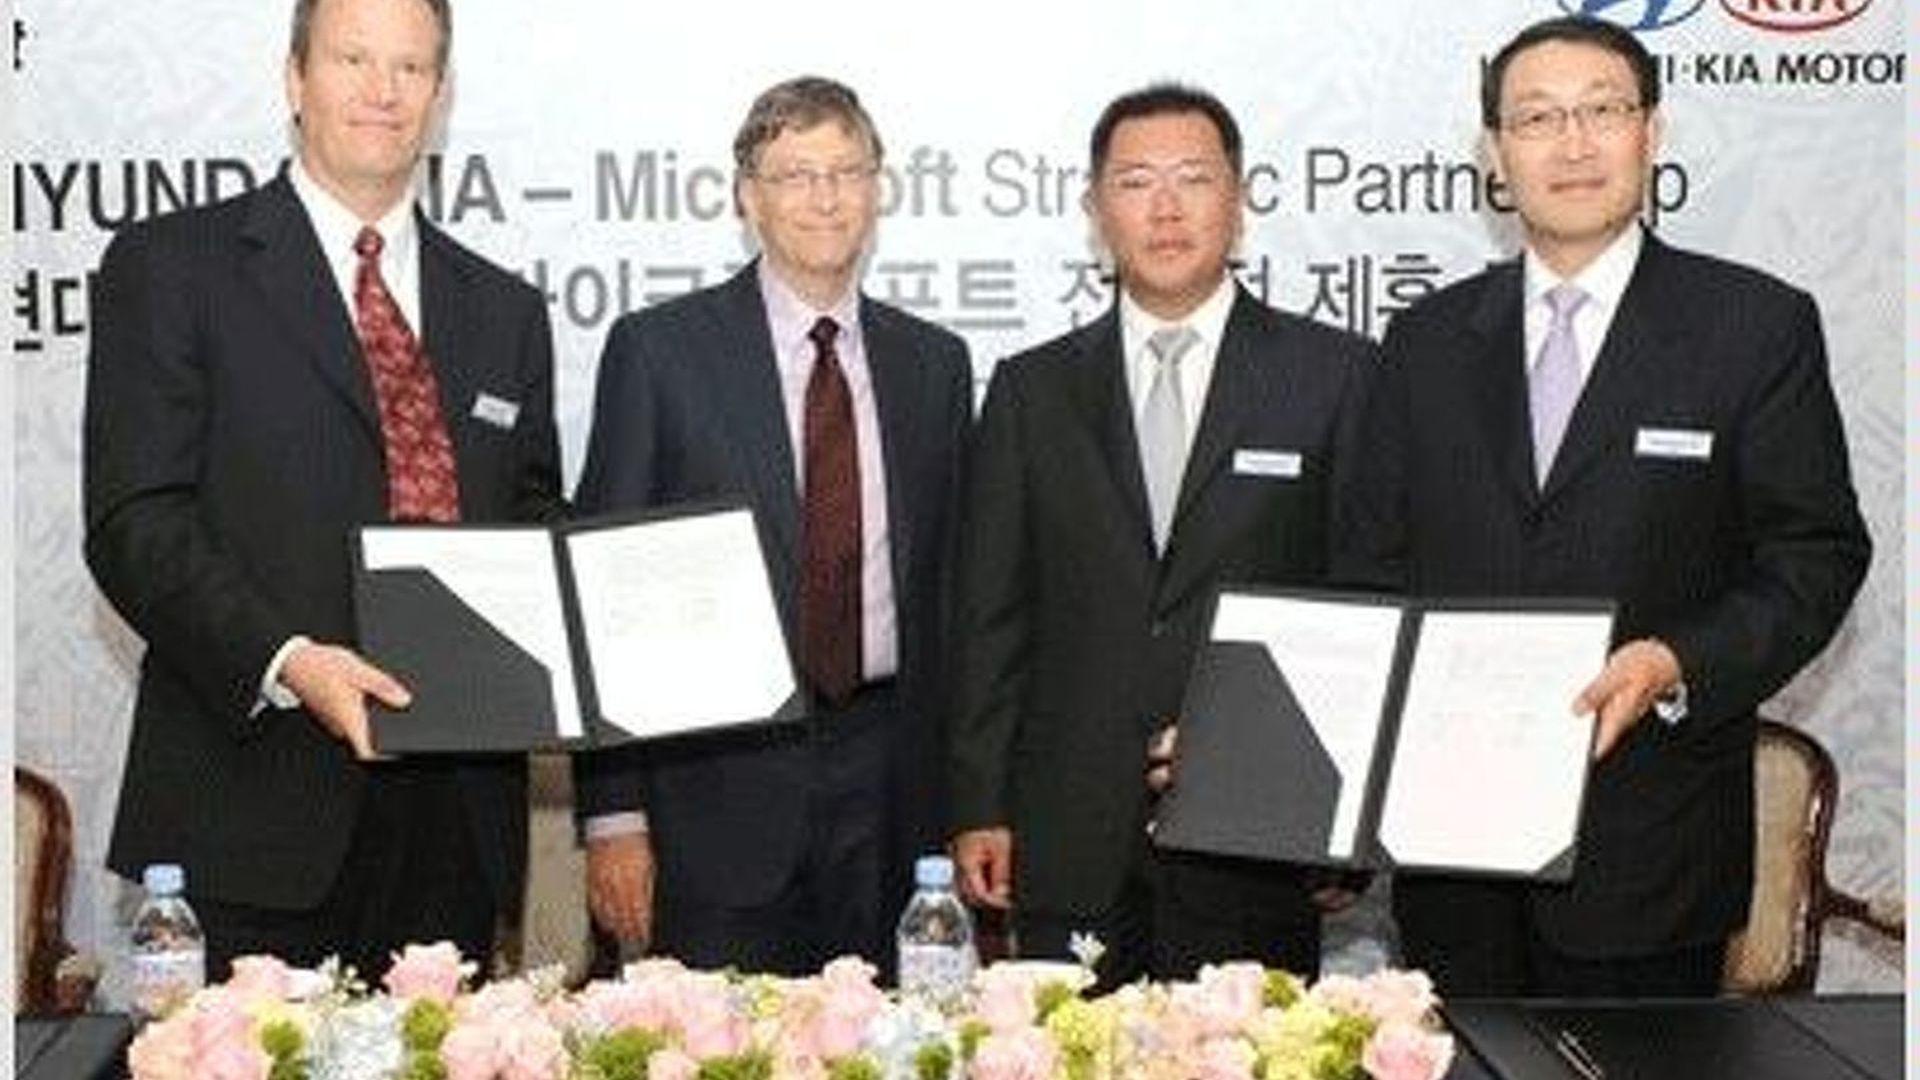 Hyundai-Kia and Microsoft to Develop Next Gen In-Car Infotainment